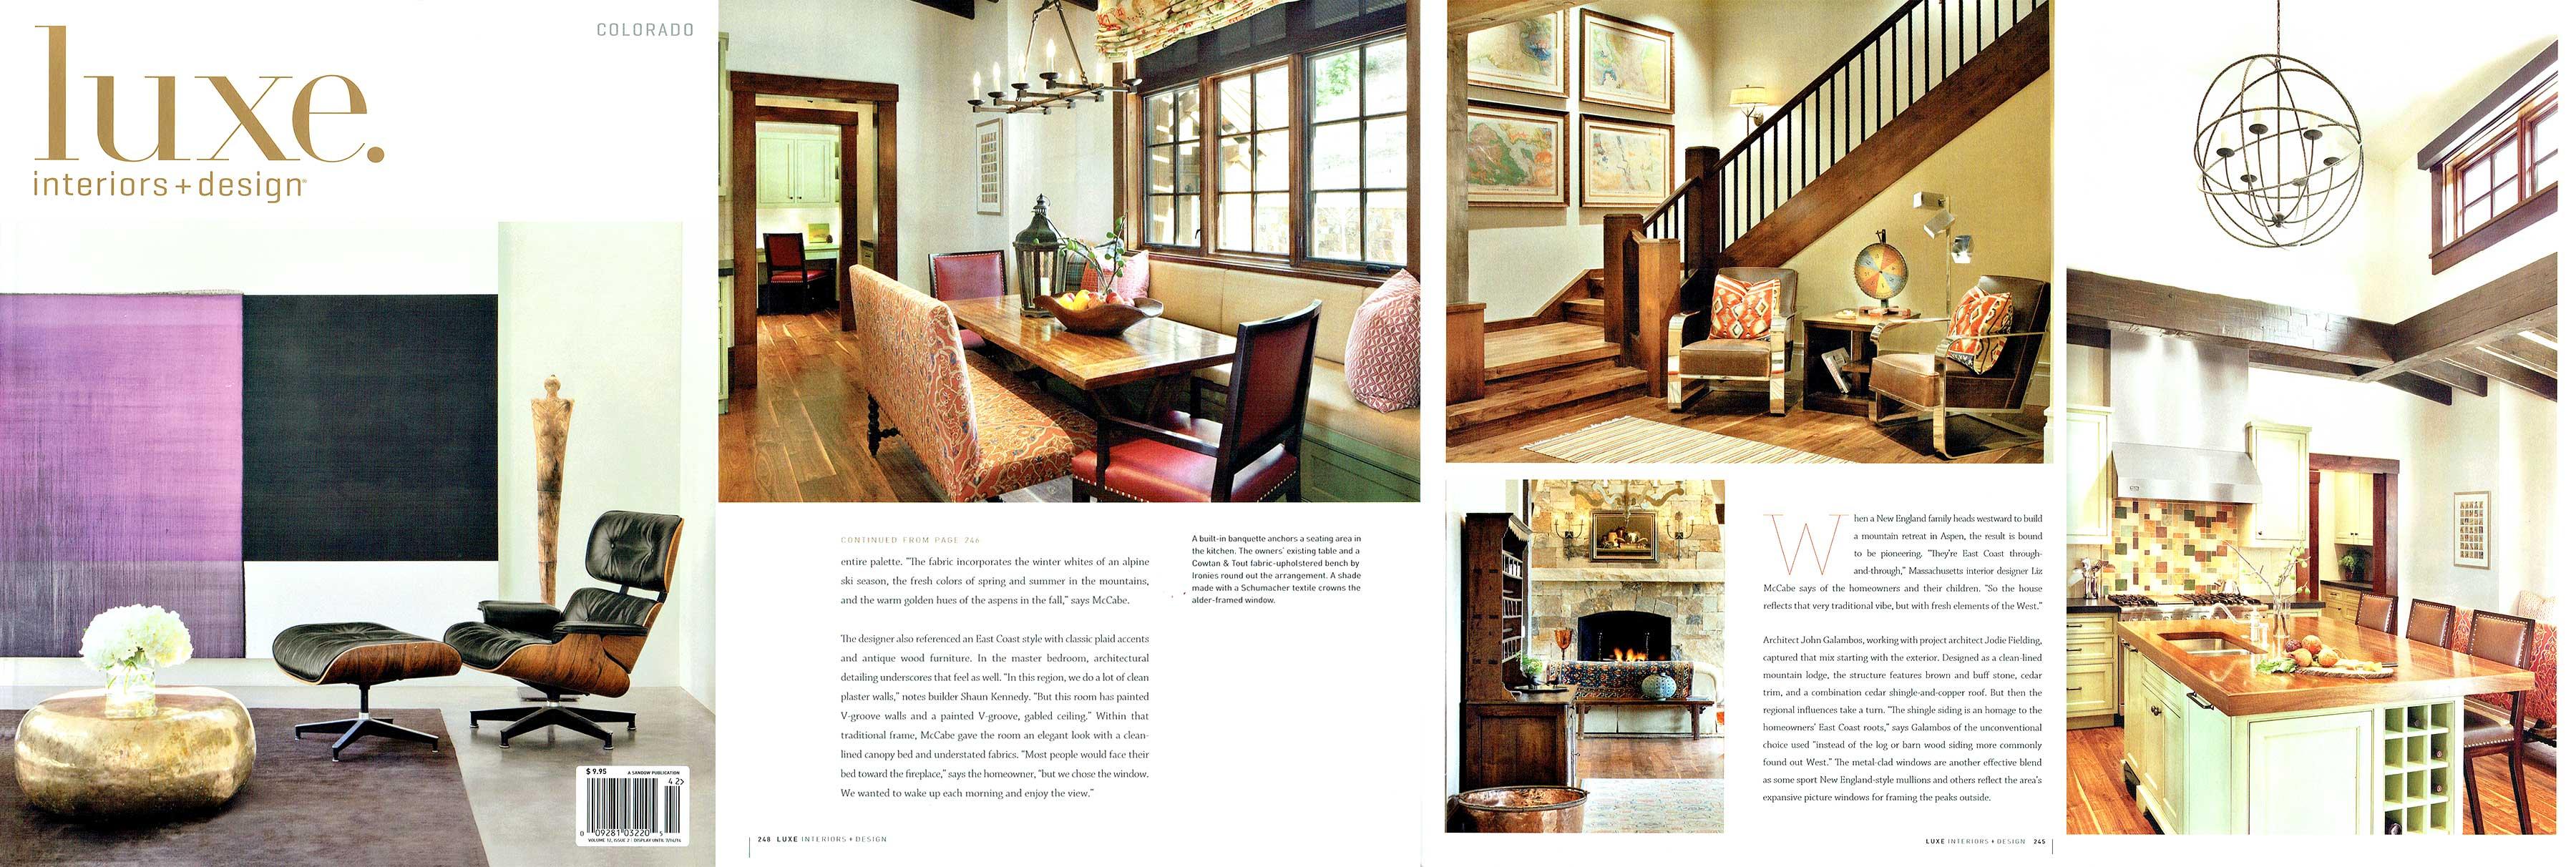 Brenda Pringle Fine Hardwood Floors Press